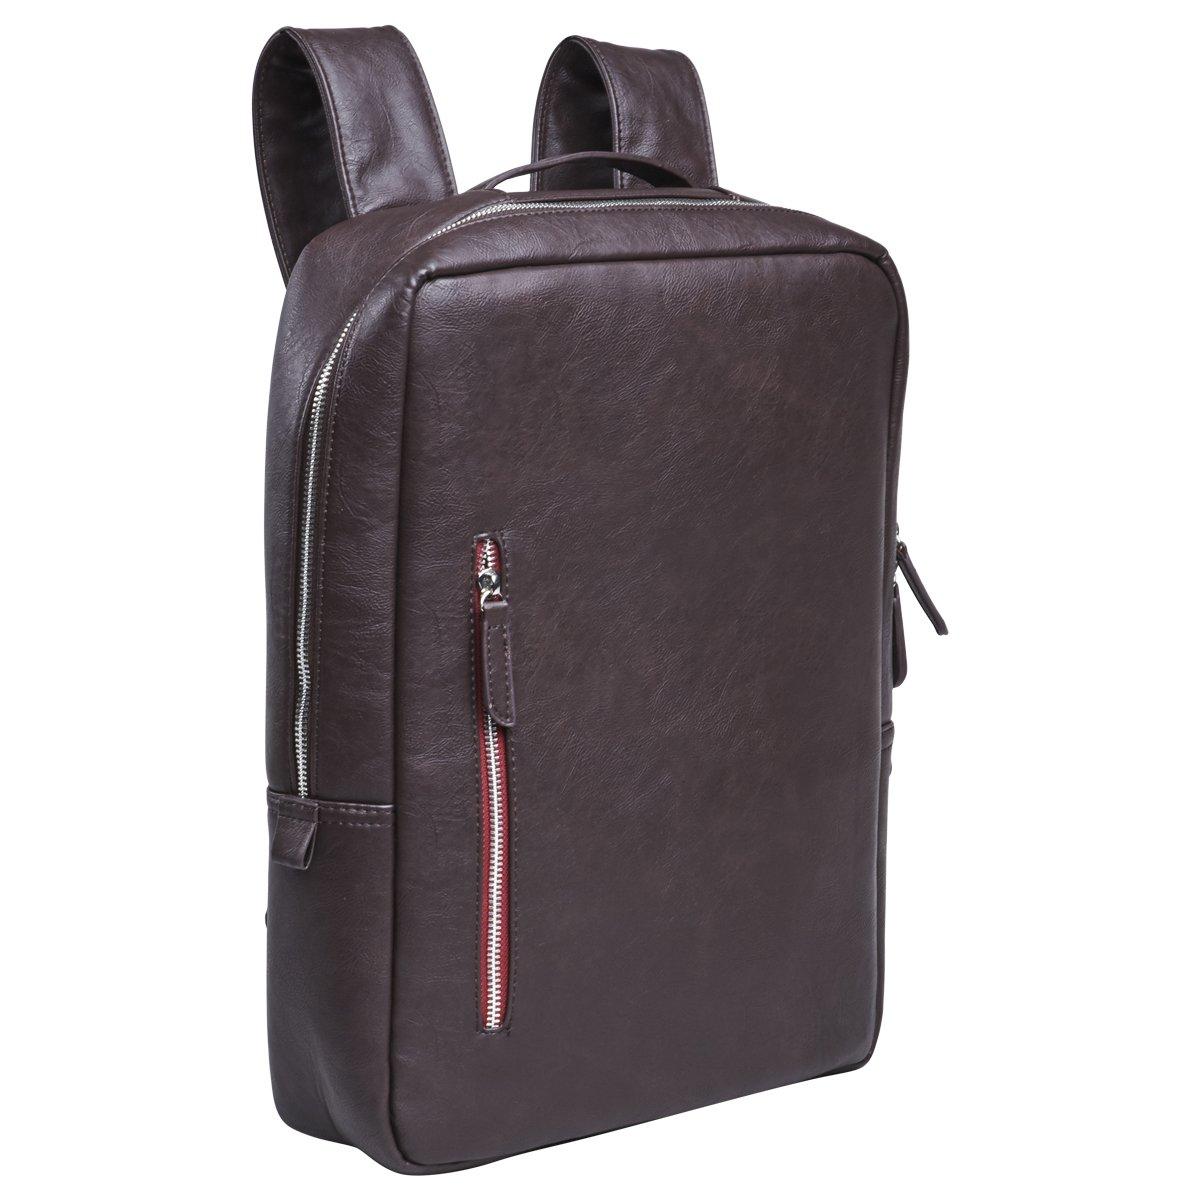 Laptop Backpack Briefcase MacBook Bag-Case - 13-14 inch, Slim Business Professional Bag Notebook/ Apple MacBook Pro Retina/ iPad Pro 12.9/ Dell xps 13/ Tablet sleeve - Brown